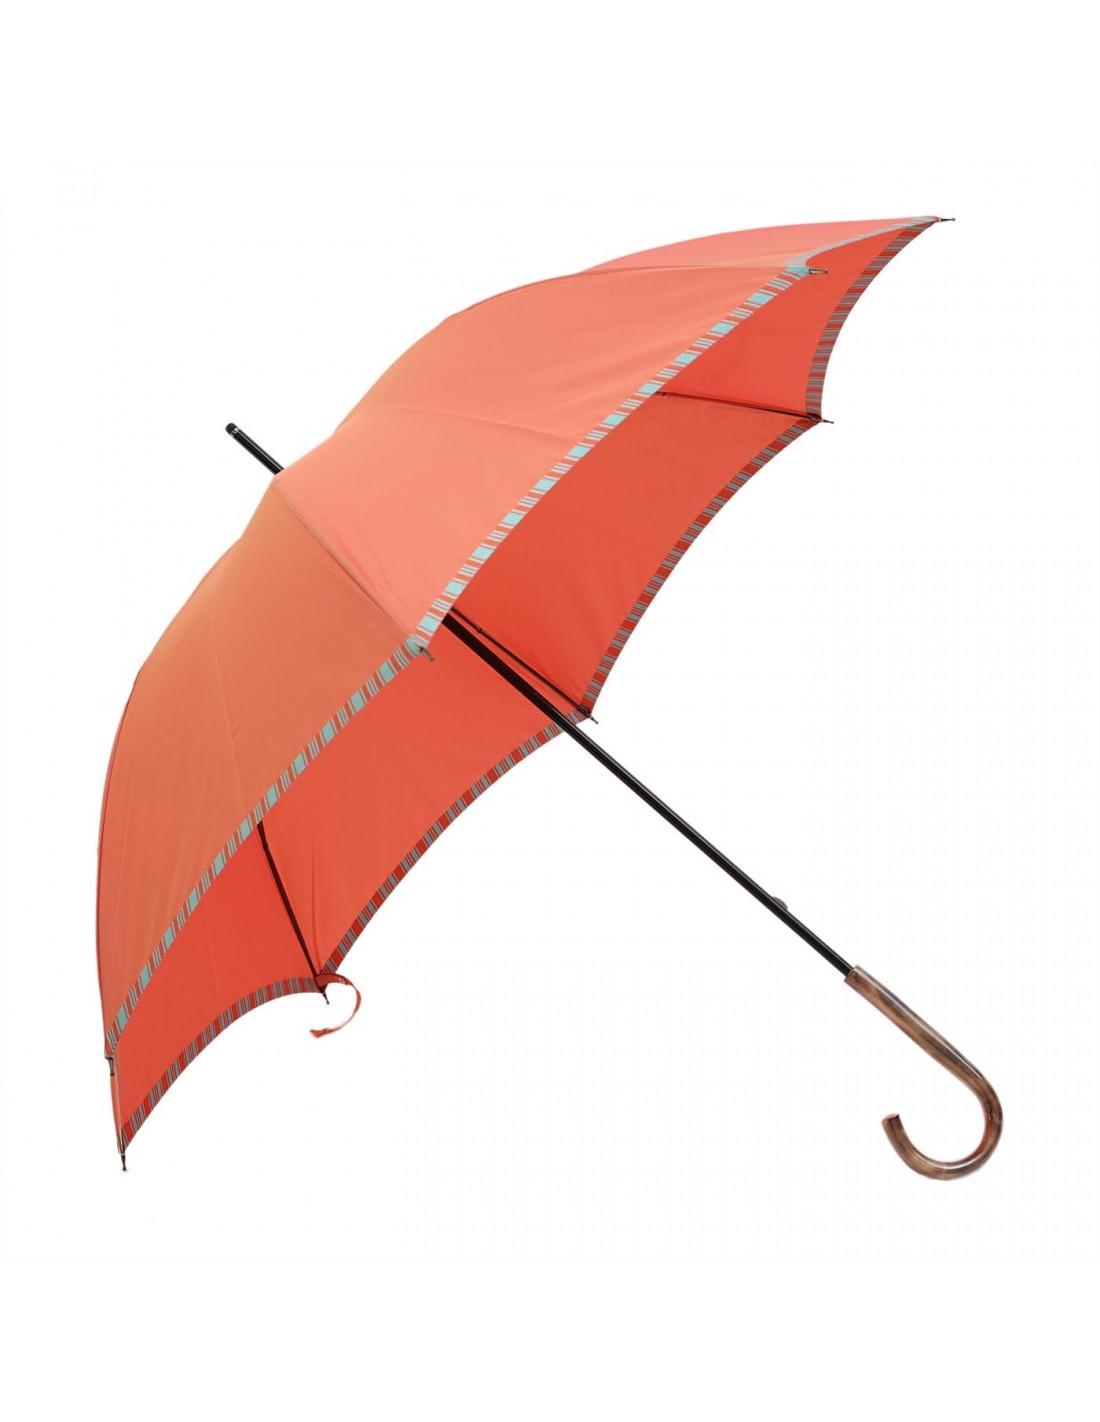 Damen Regenschirm Chambrey Apricot